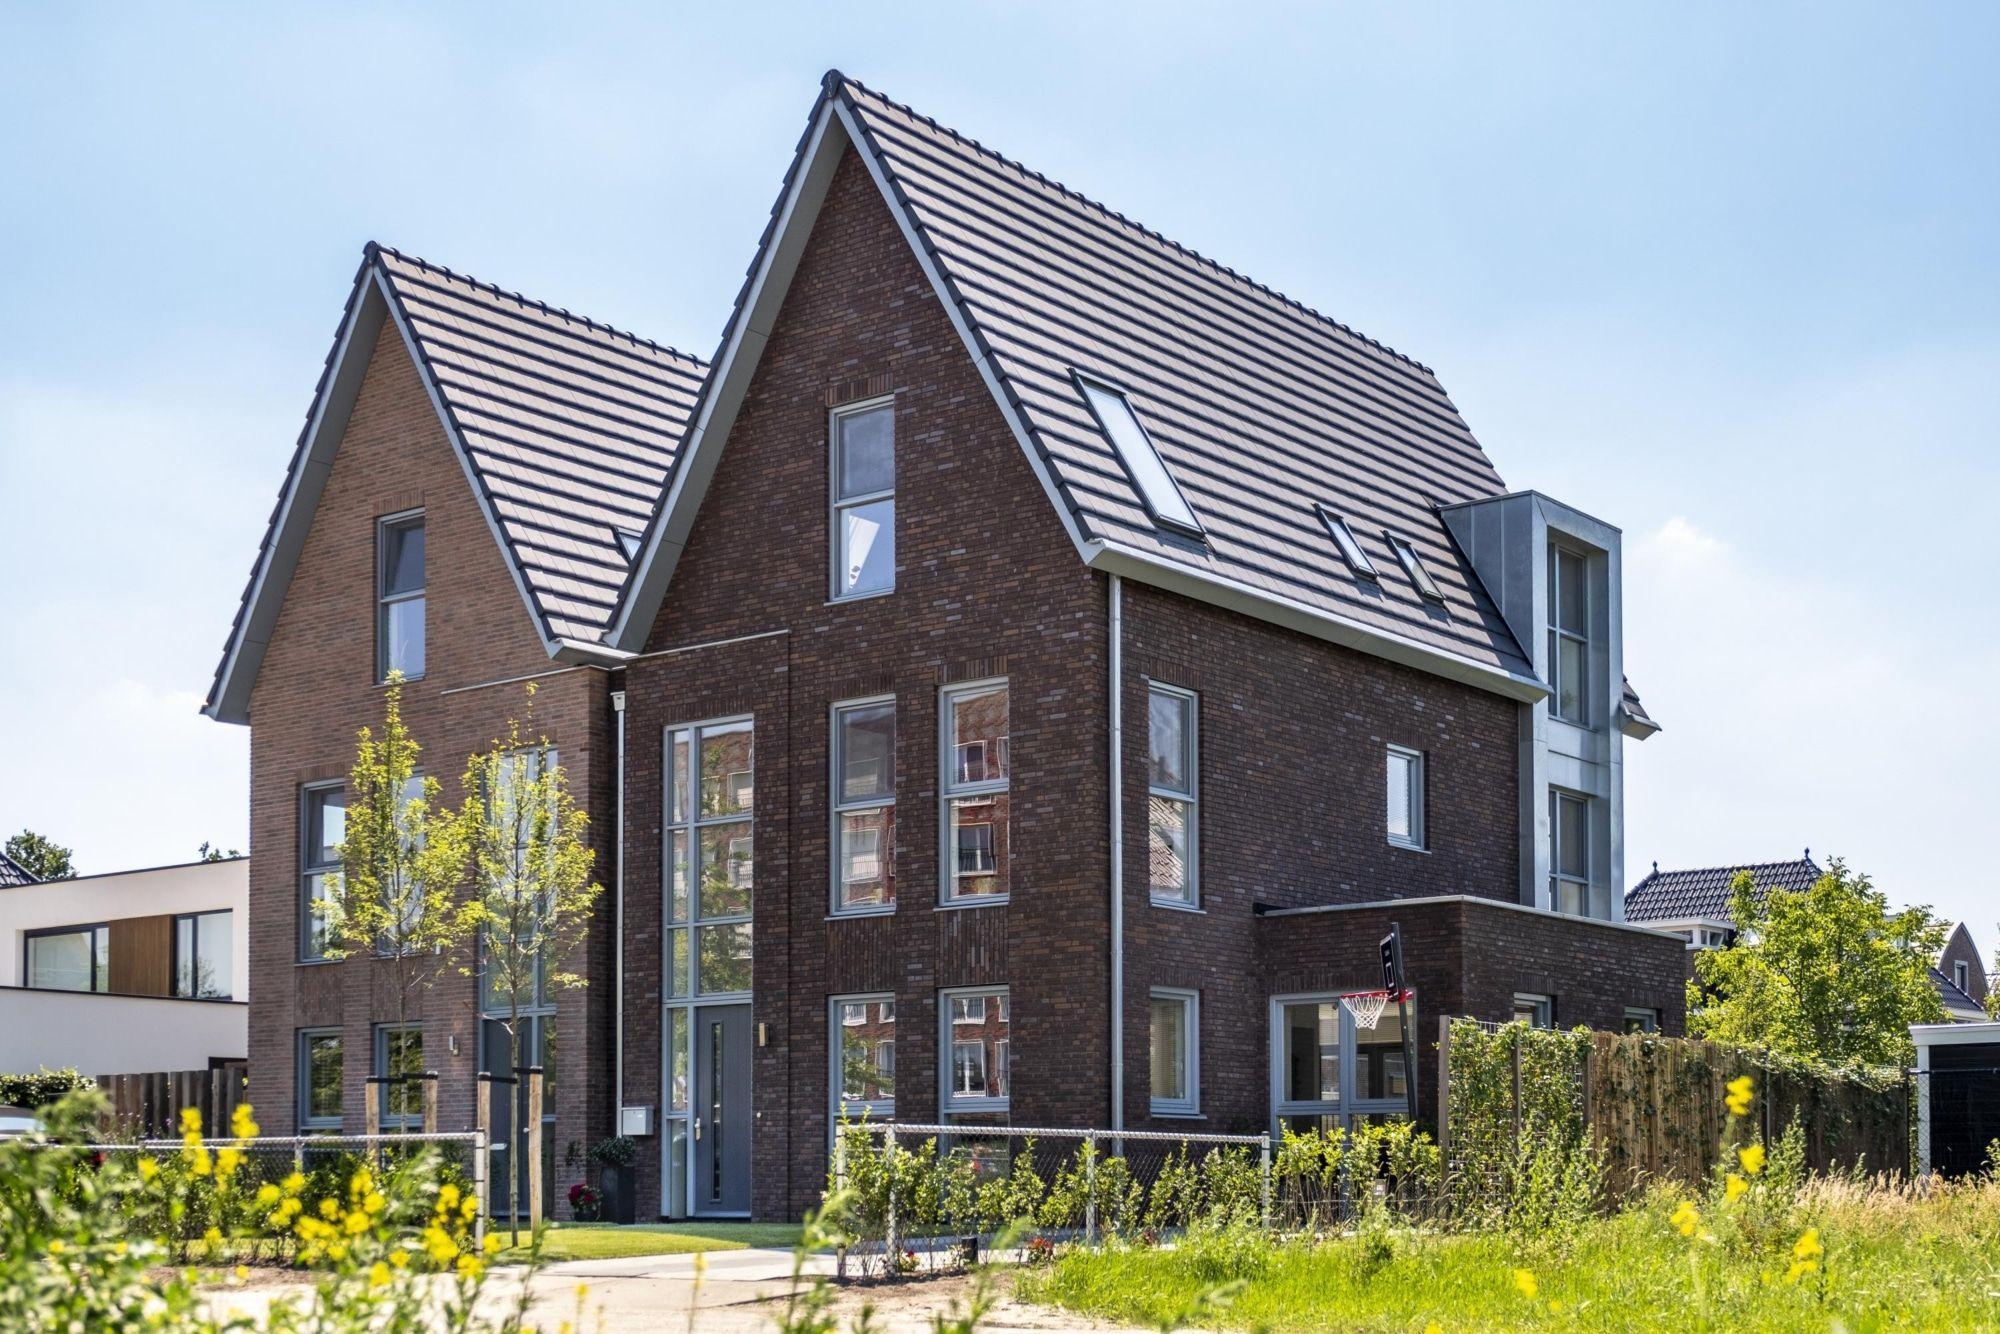 2 Onder 1 Kap Nieuwbouw Woning Allure Bouw Nieuwbouw Huisstijl Architectuur